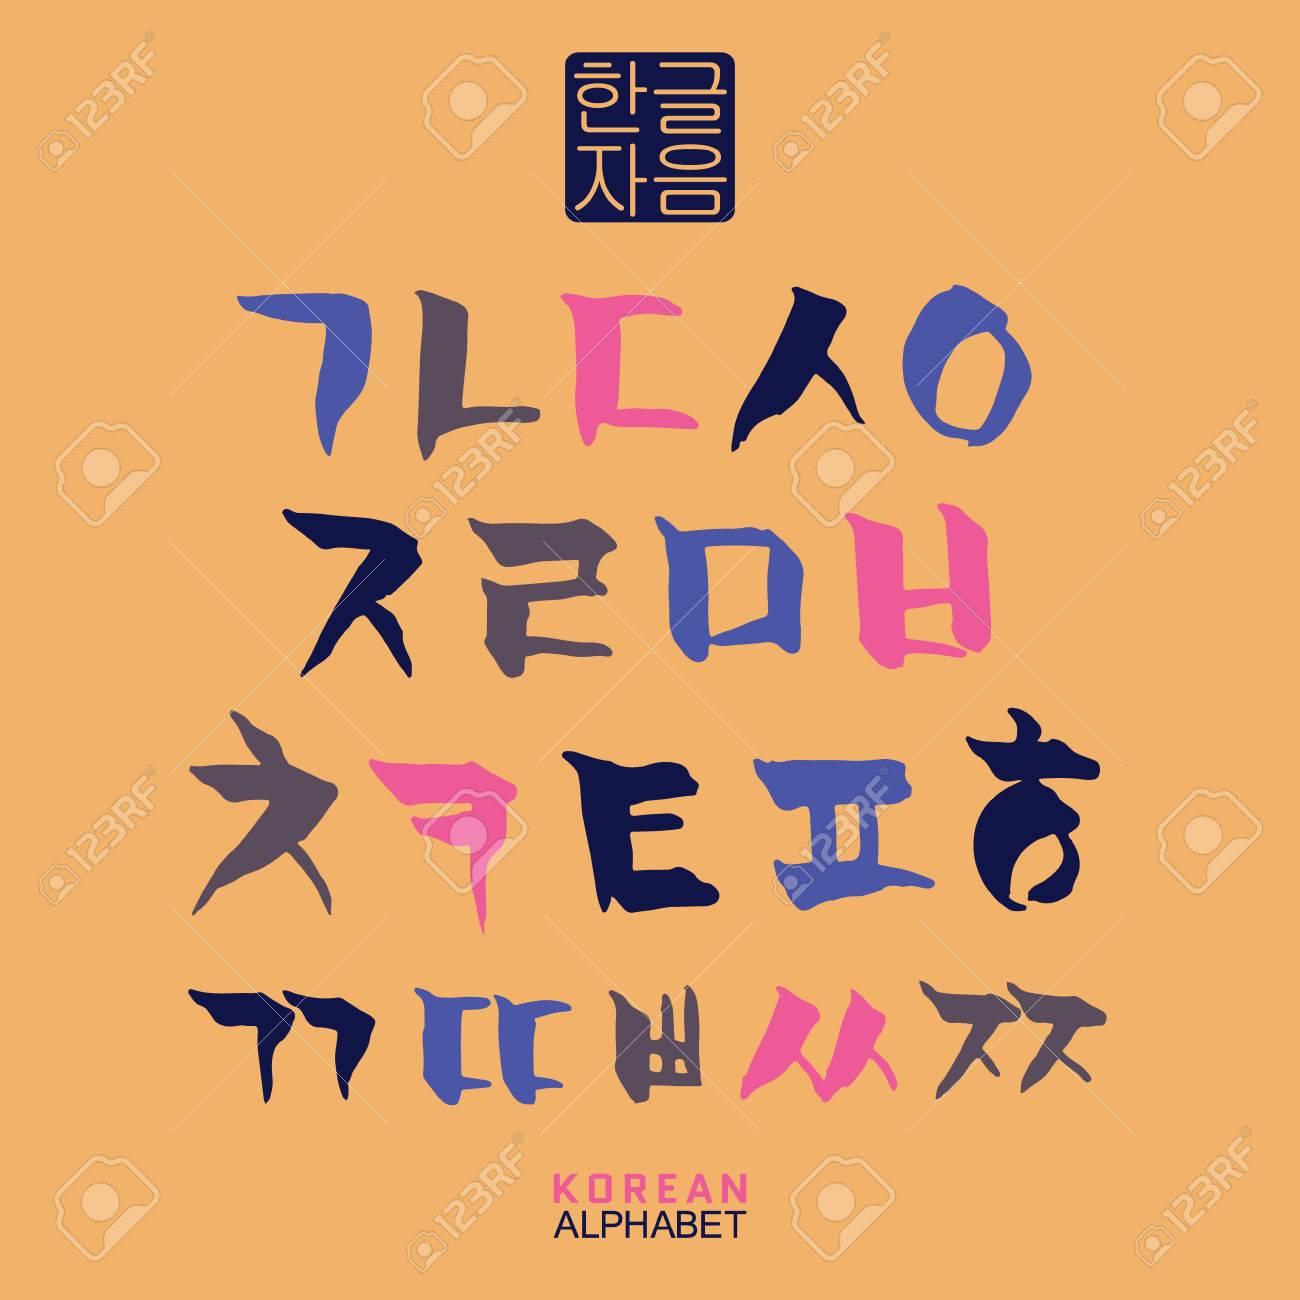 korean vector alphabet set hangul consonants in hand drawn traditional royalty free cliparts vectors and stock illustration image 59380372 korean vector alphabet set hangul consonants in hand drawn traditional